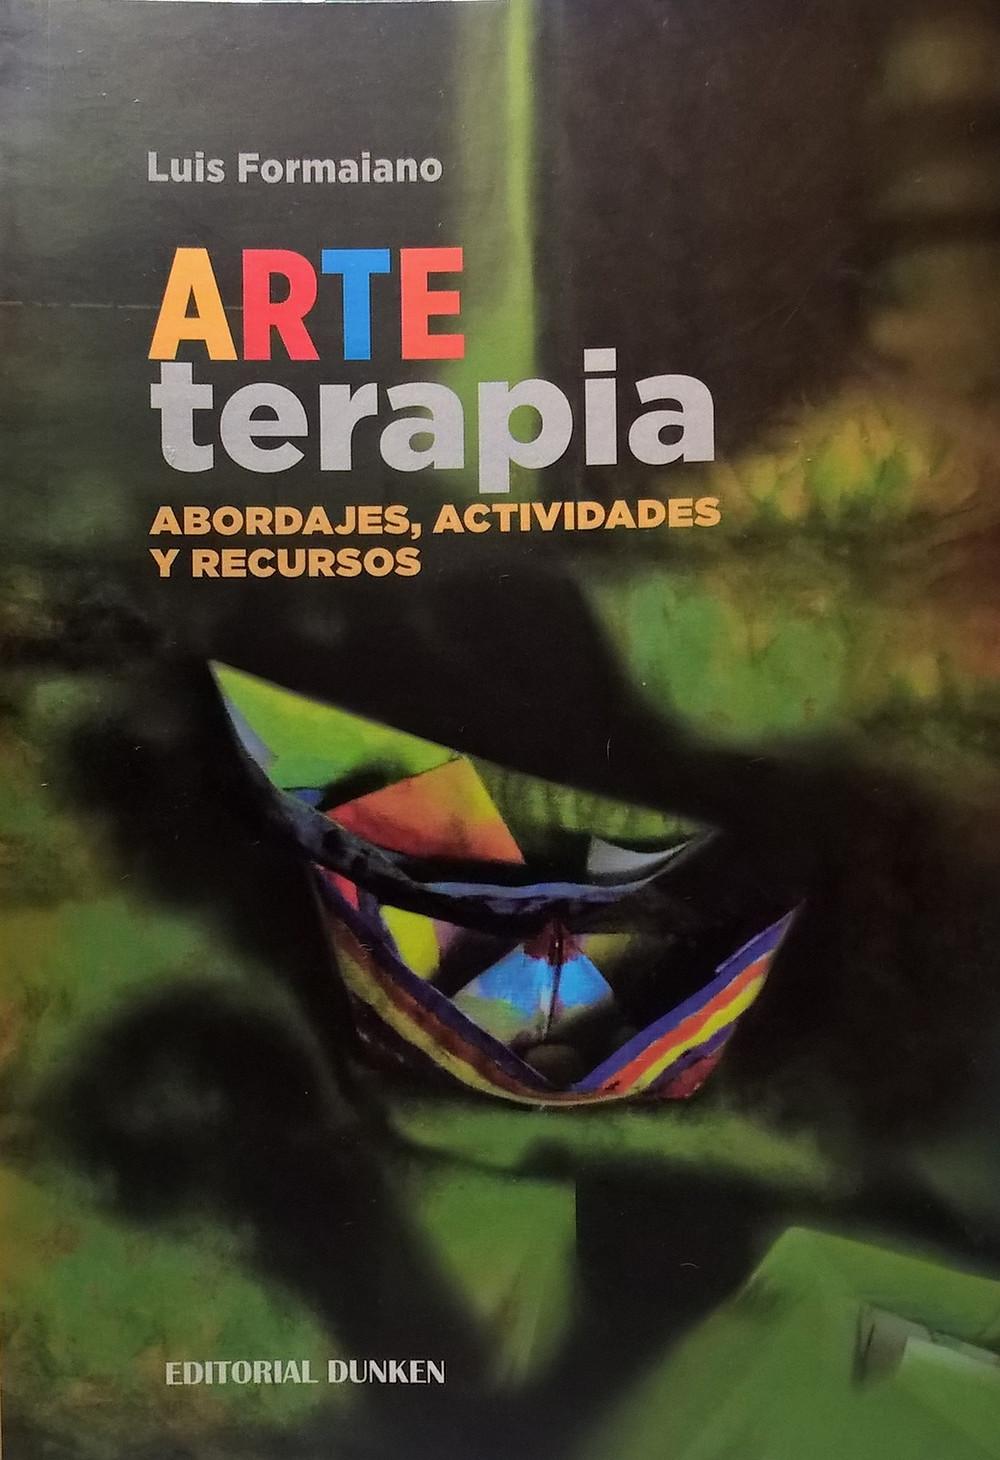 Arteterapia, Luis Formaiano